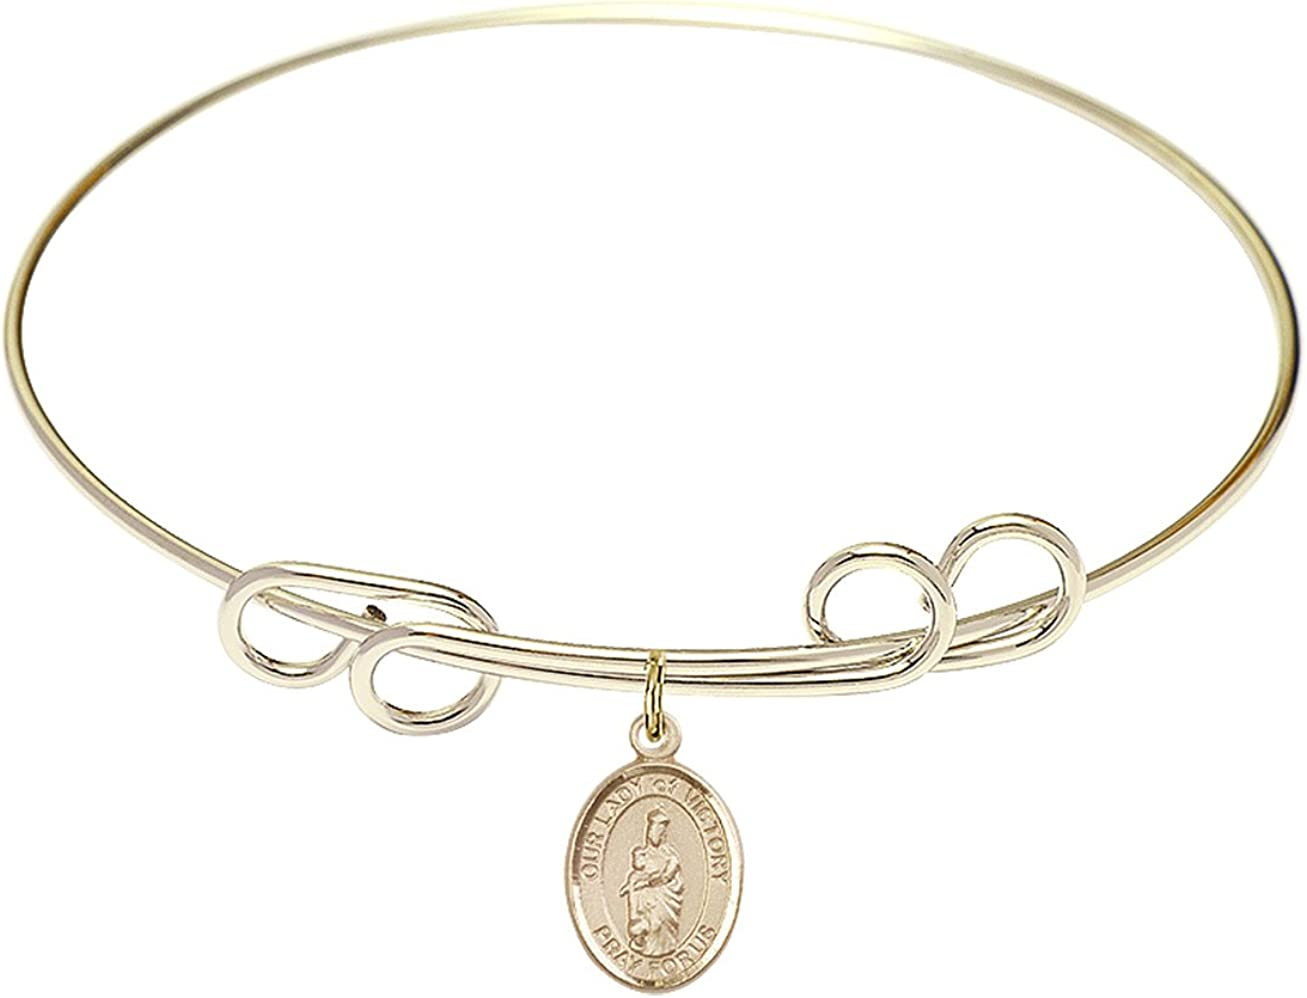 DiamondJewelryNY Double Loop Bangle Bracelet with a O/L of Victory Charm.